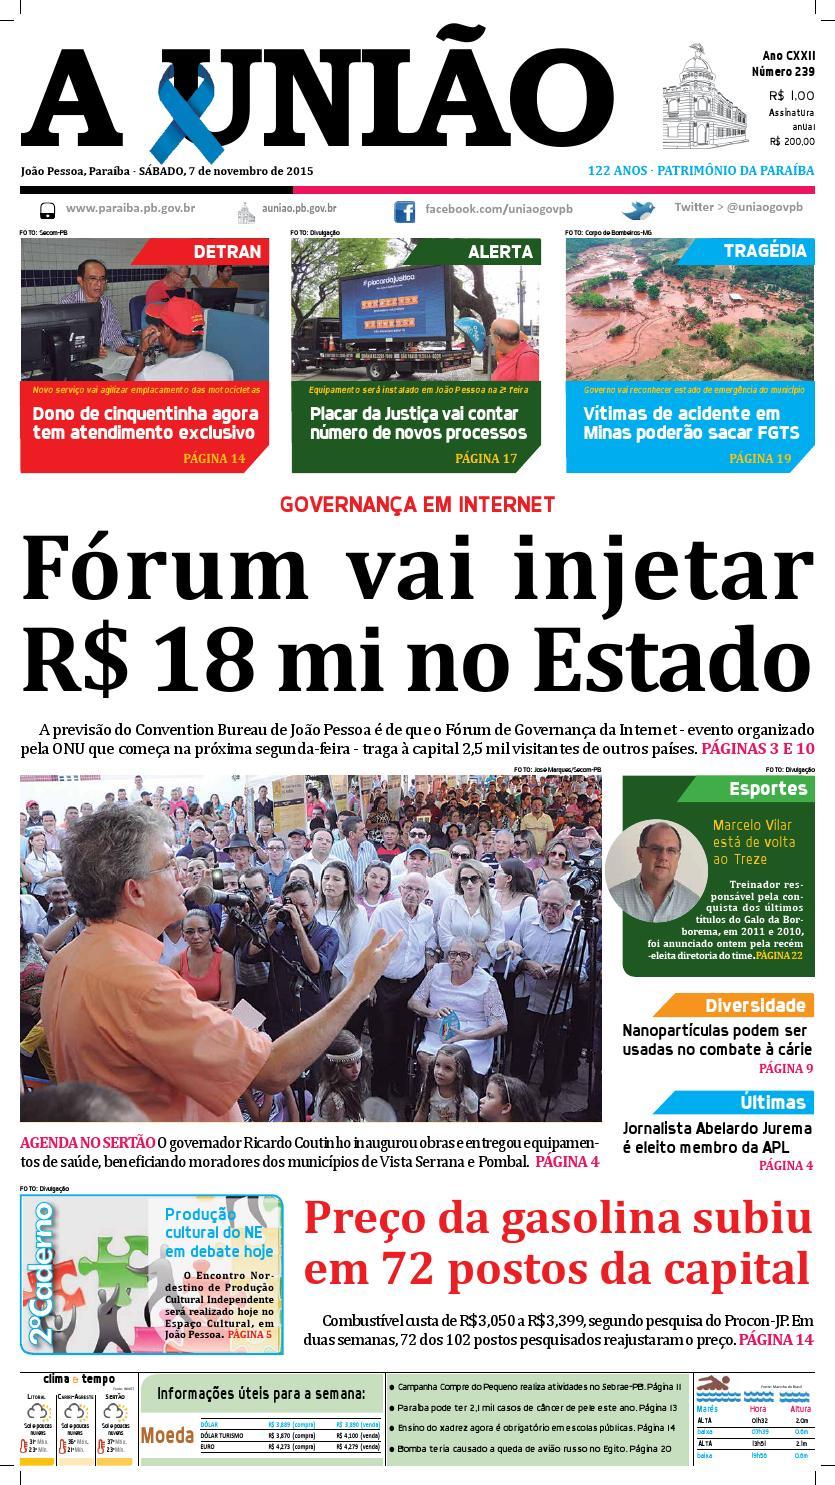 df17c38a746 Jornal A União - 07 11 2015 by Jornal A União - issuu